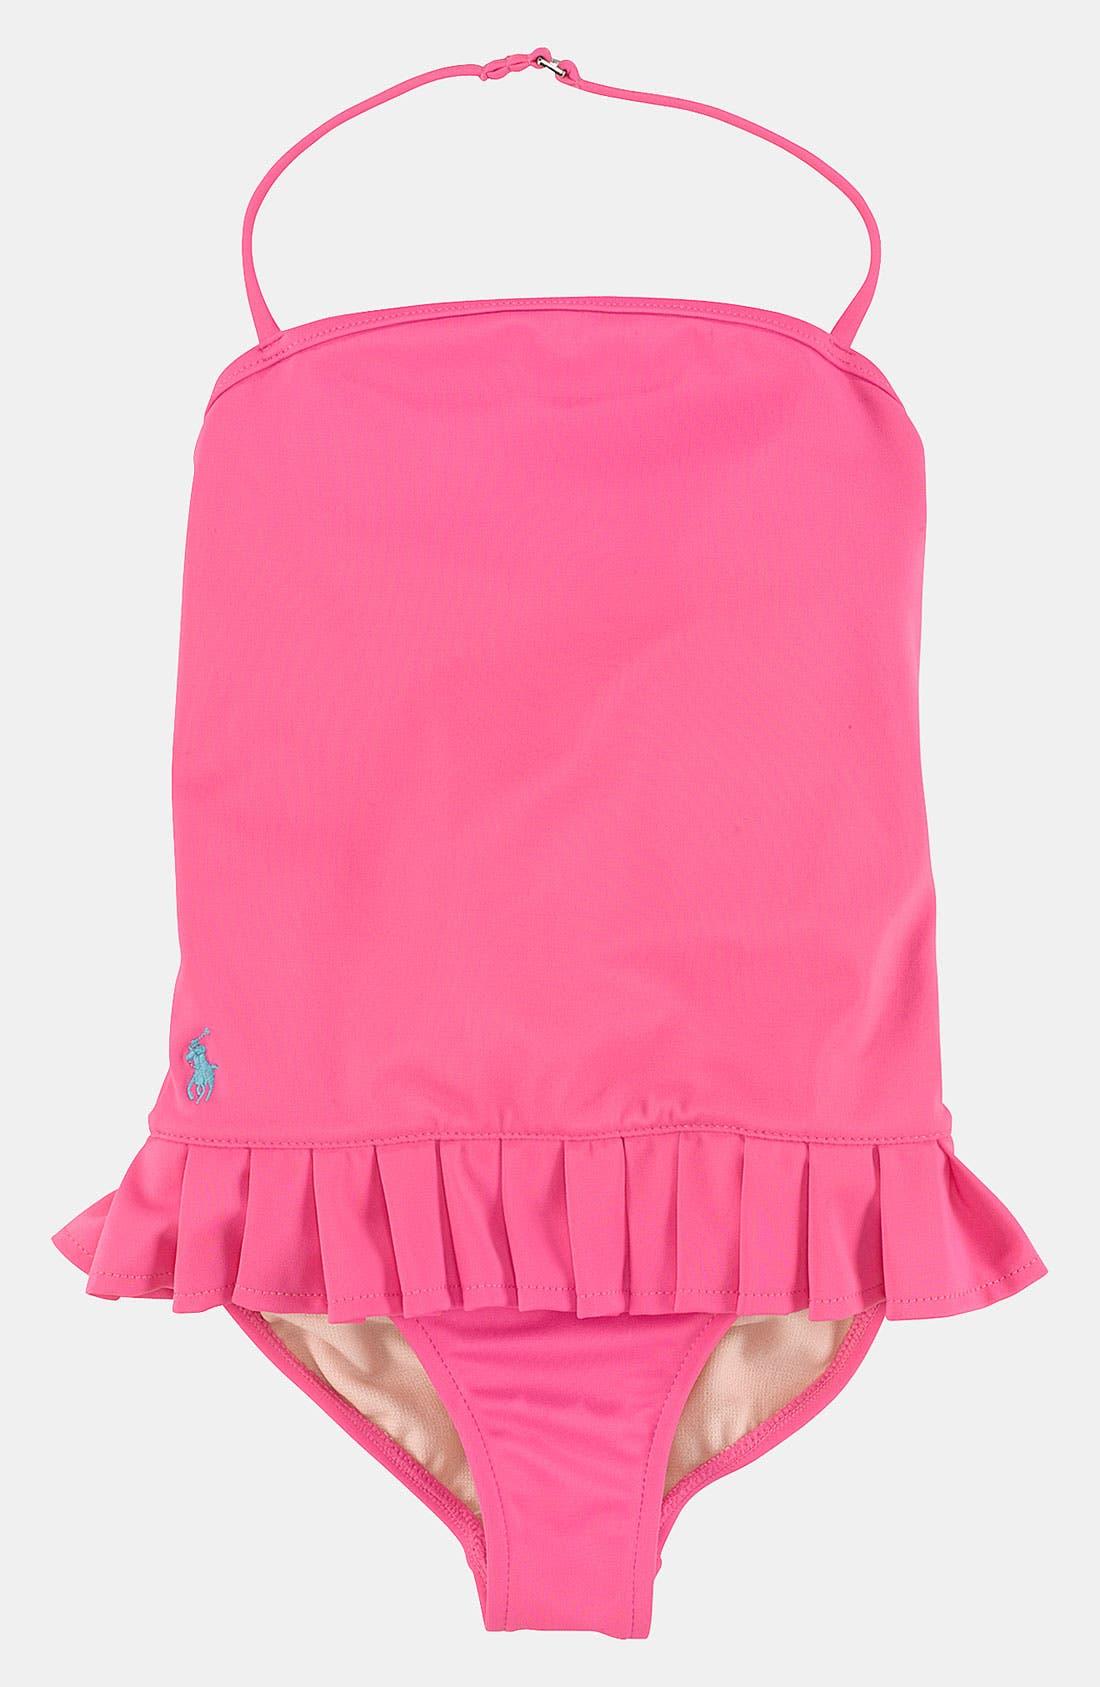 Alternate Image 1 Selected - Ralph Lauren One Piece Swimsuit (Toddler)